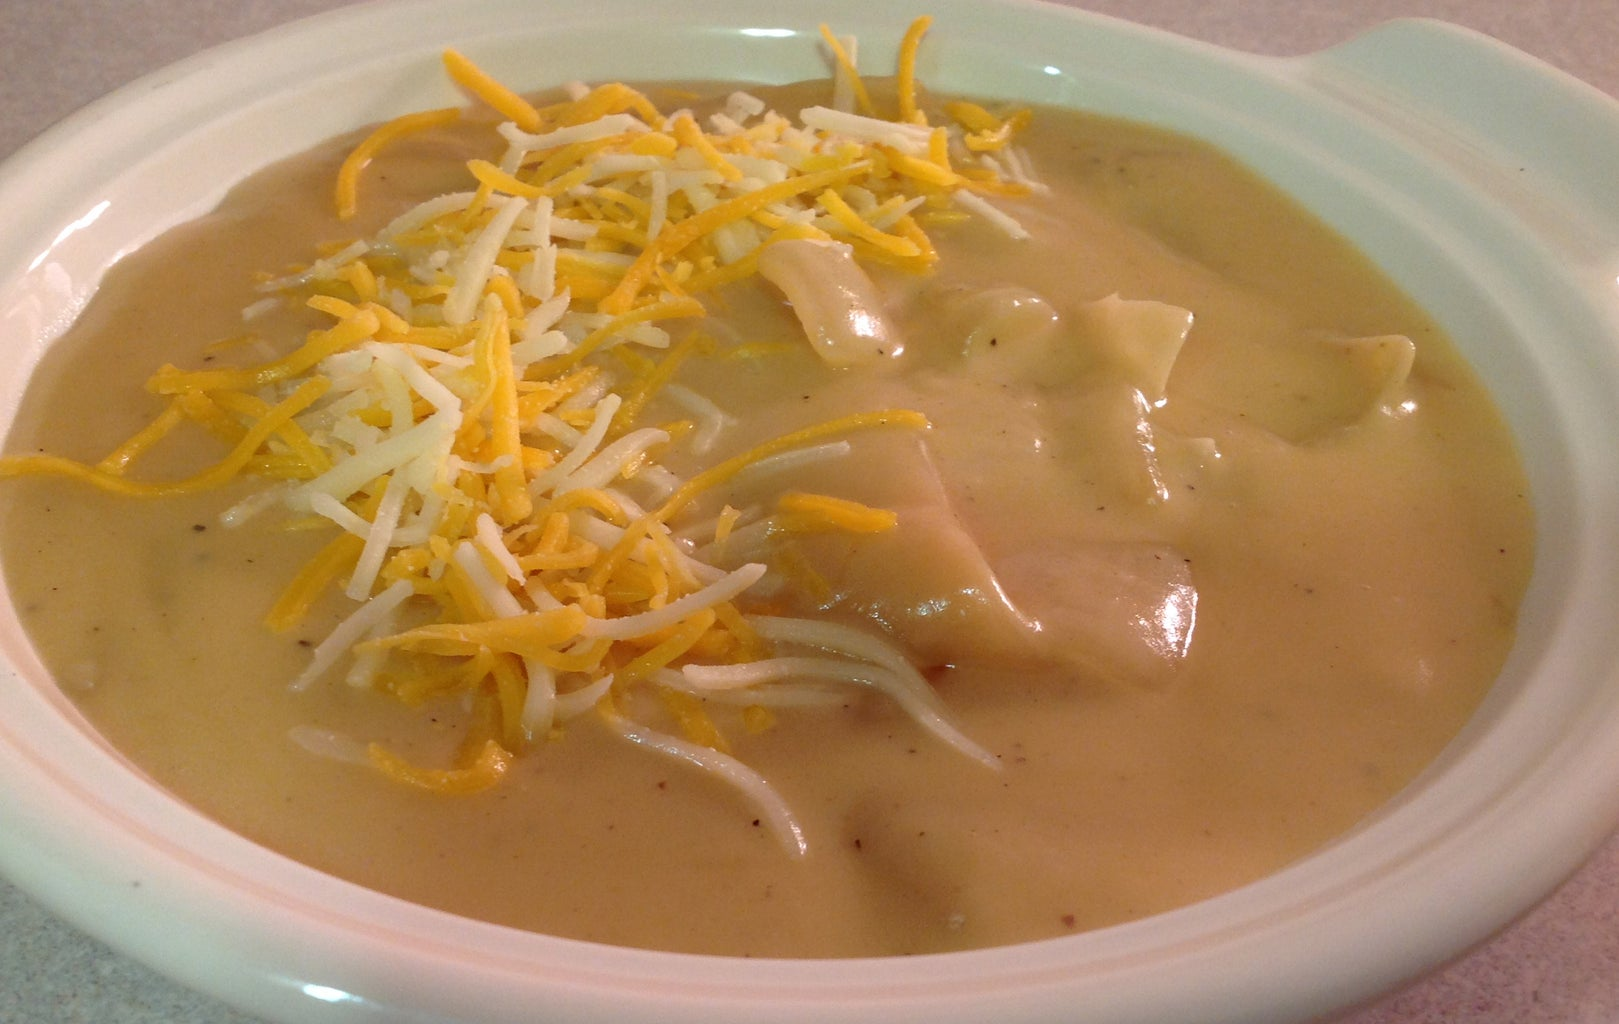 Outbacks Creamy Onion Soup